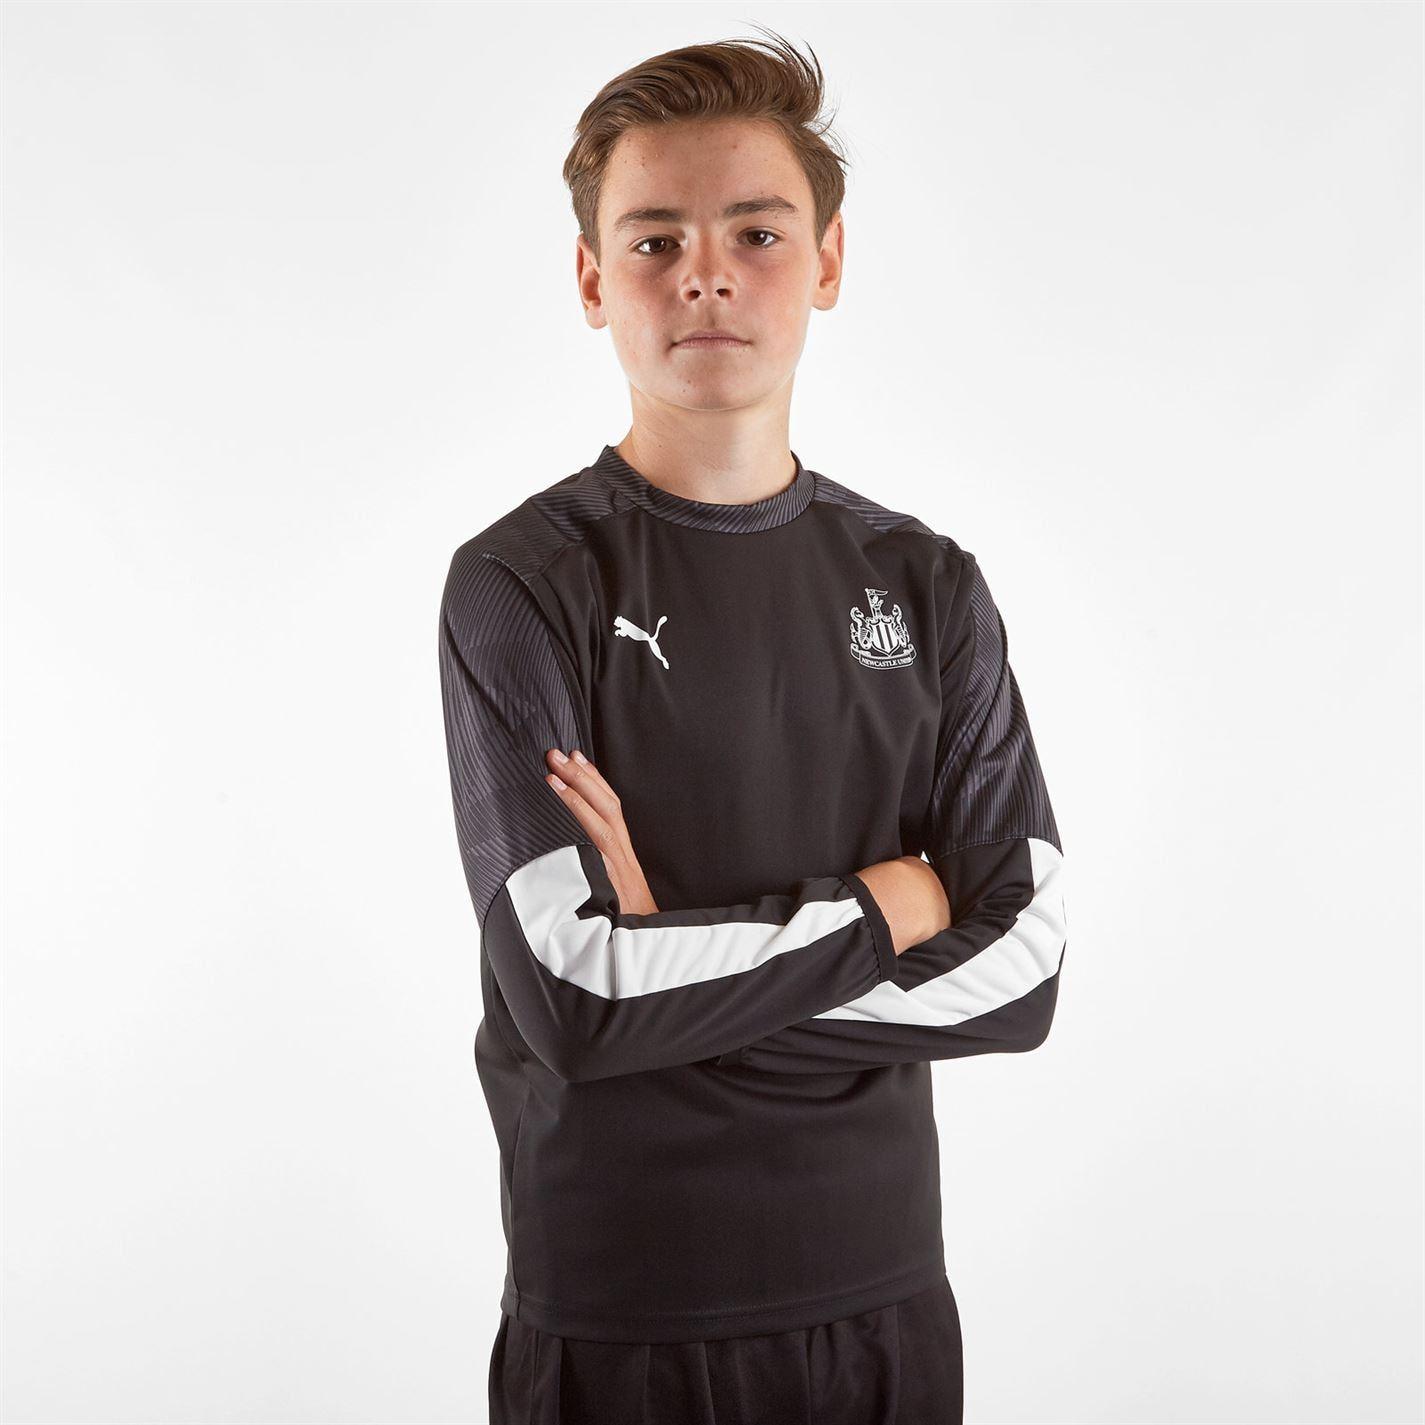 Puma-Newcastle-United-T-Shirt-Junior-Football-Boys-Soccer-Fan-Jersey-Drill-Top thumbnail 3